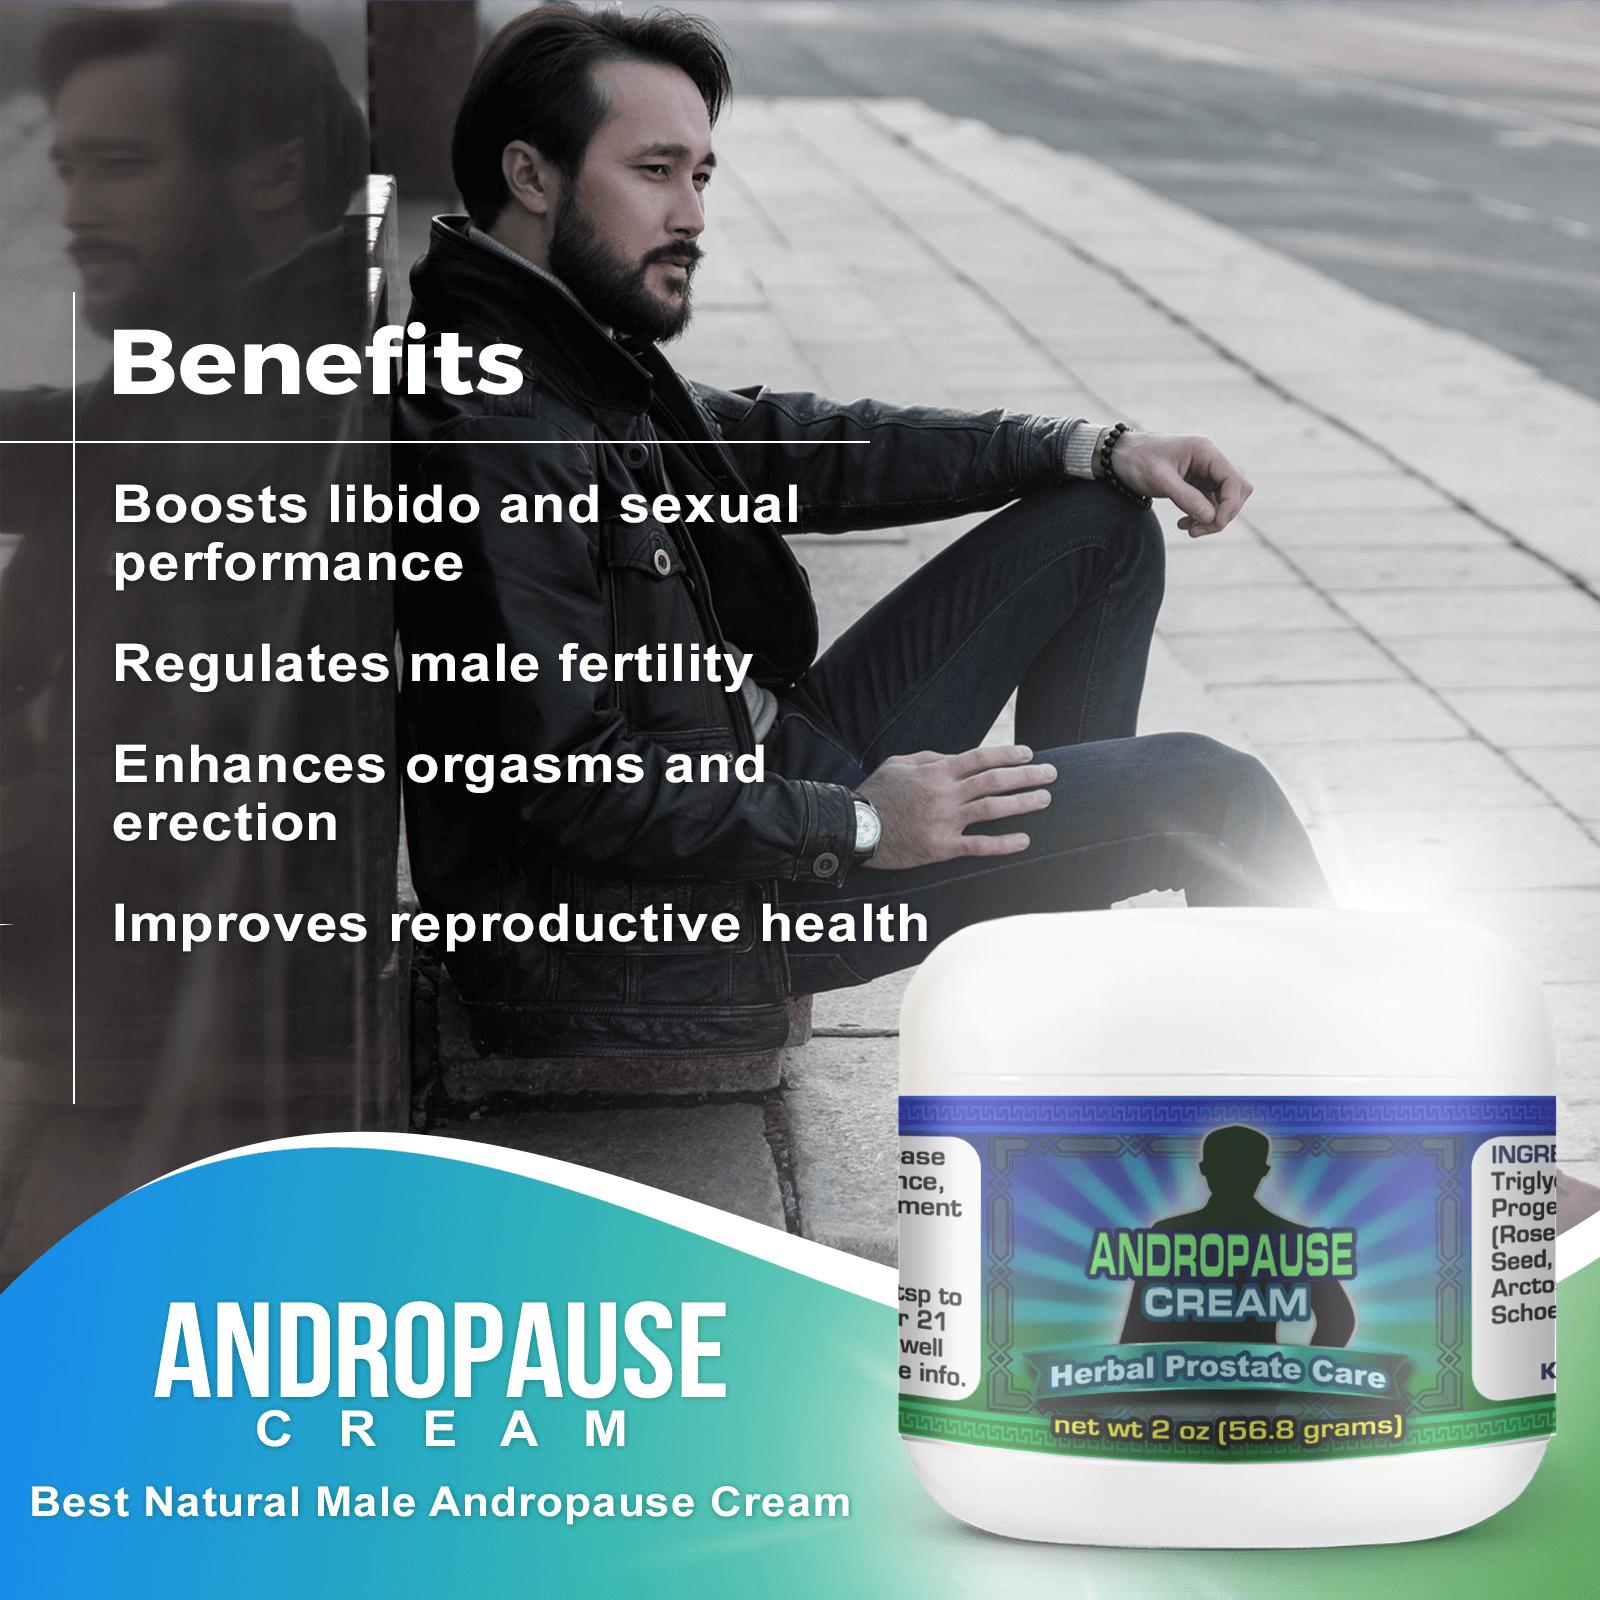 Andropause Cream Increase Male Libido Infographics